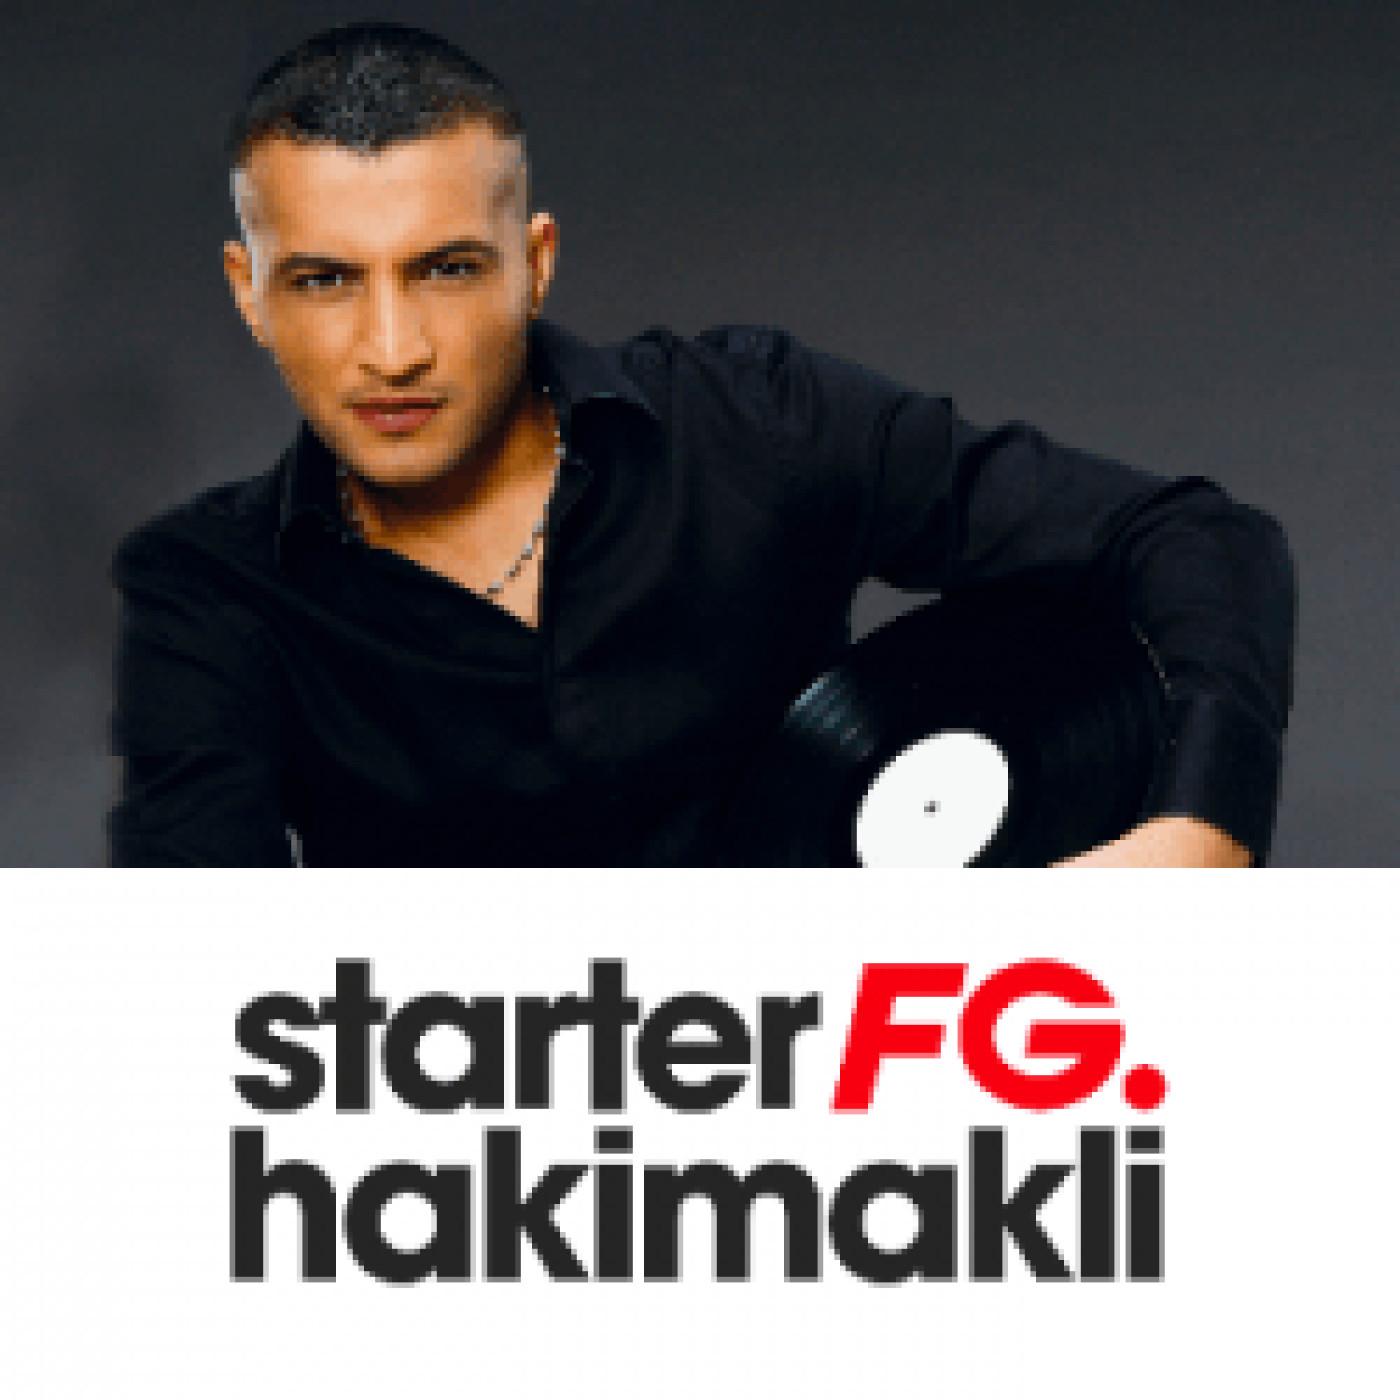 STARTER FG BY HAKIMAKLI MARDI 29 DECEMBRE 2020